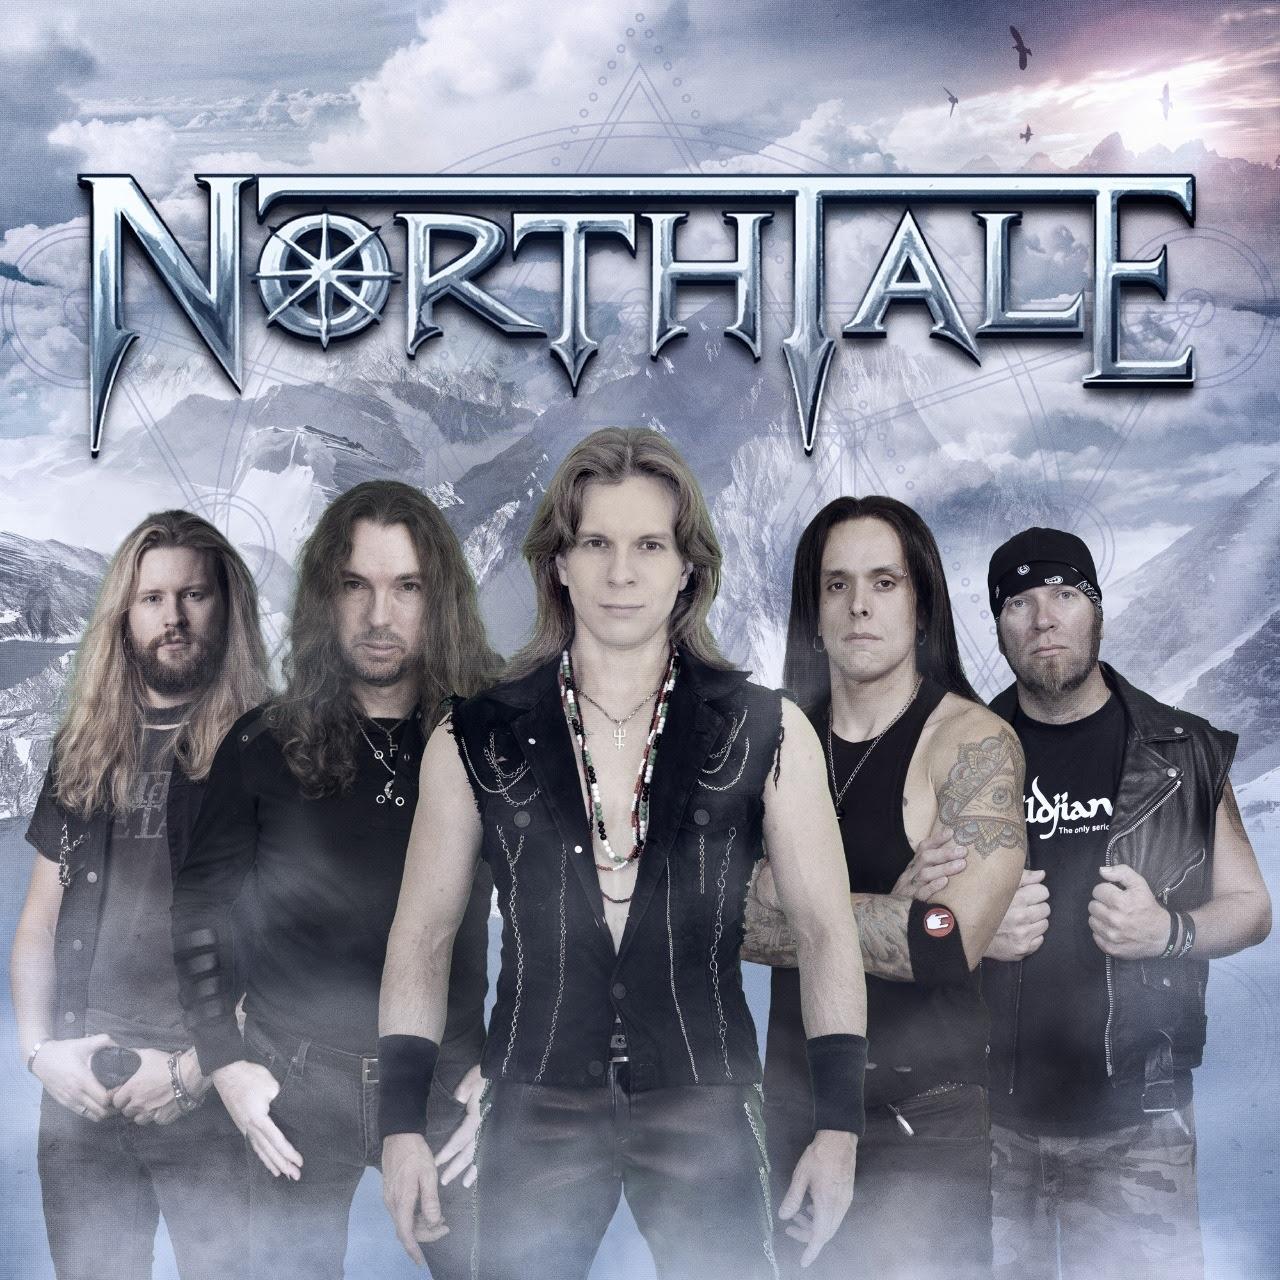 Northtale band